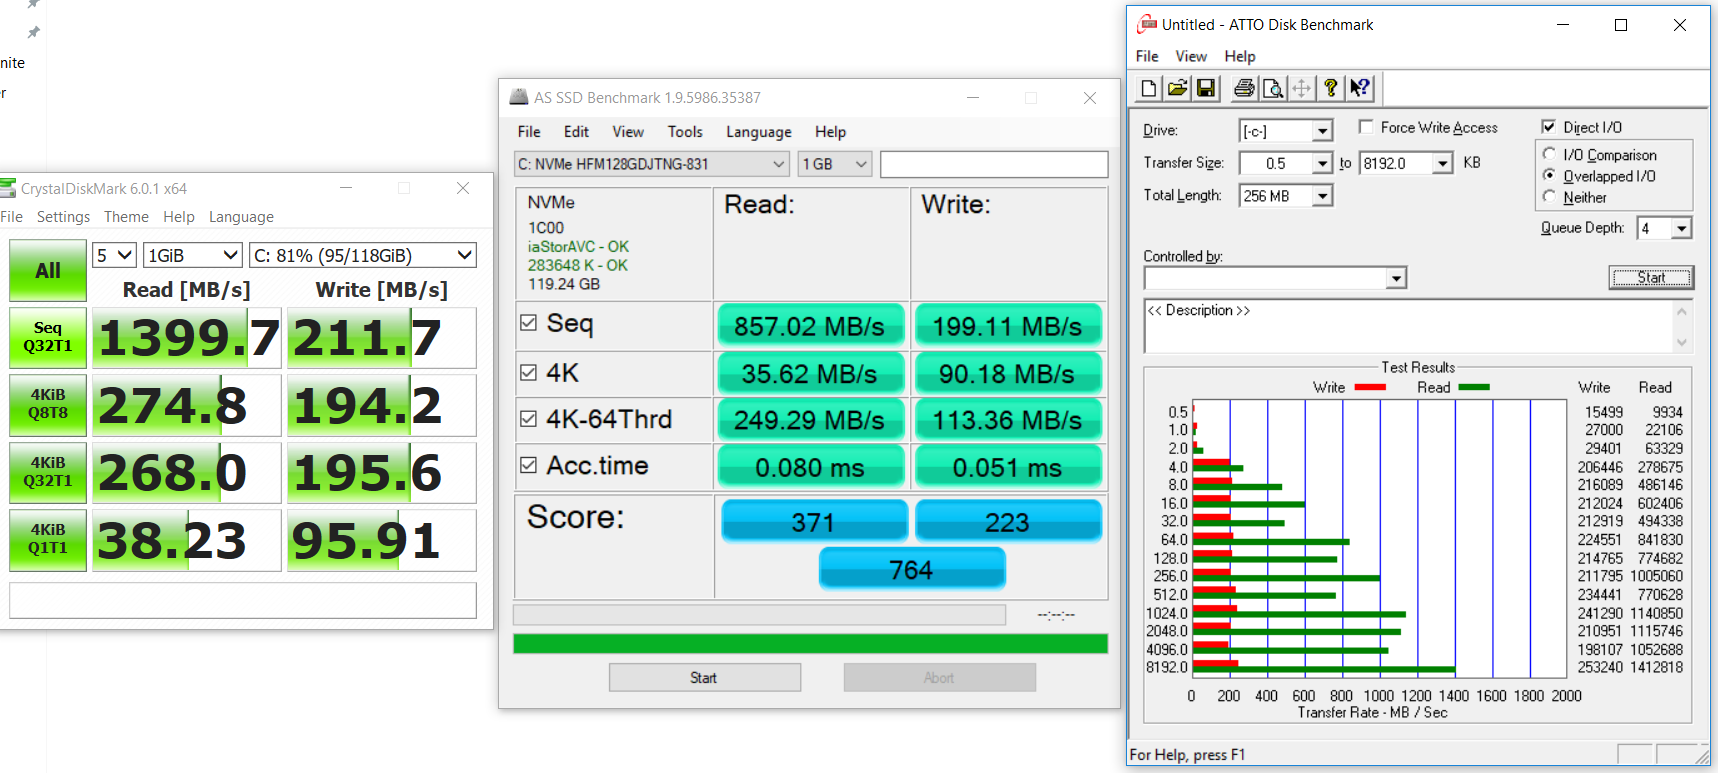 Asus TUF Gaming FX505 review (FX505GE - i7-8750H, GTX 1050 Ti, 144